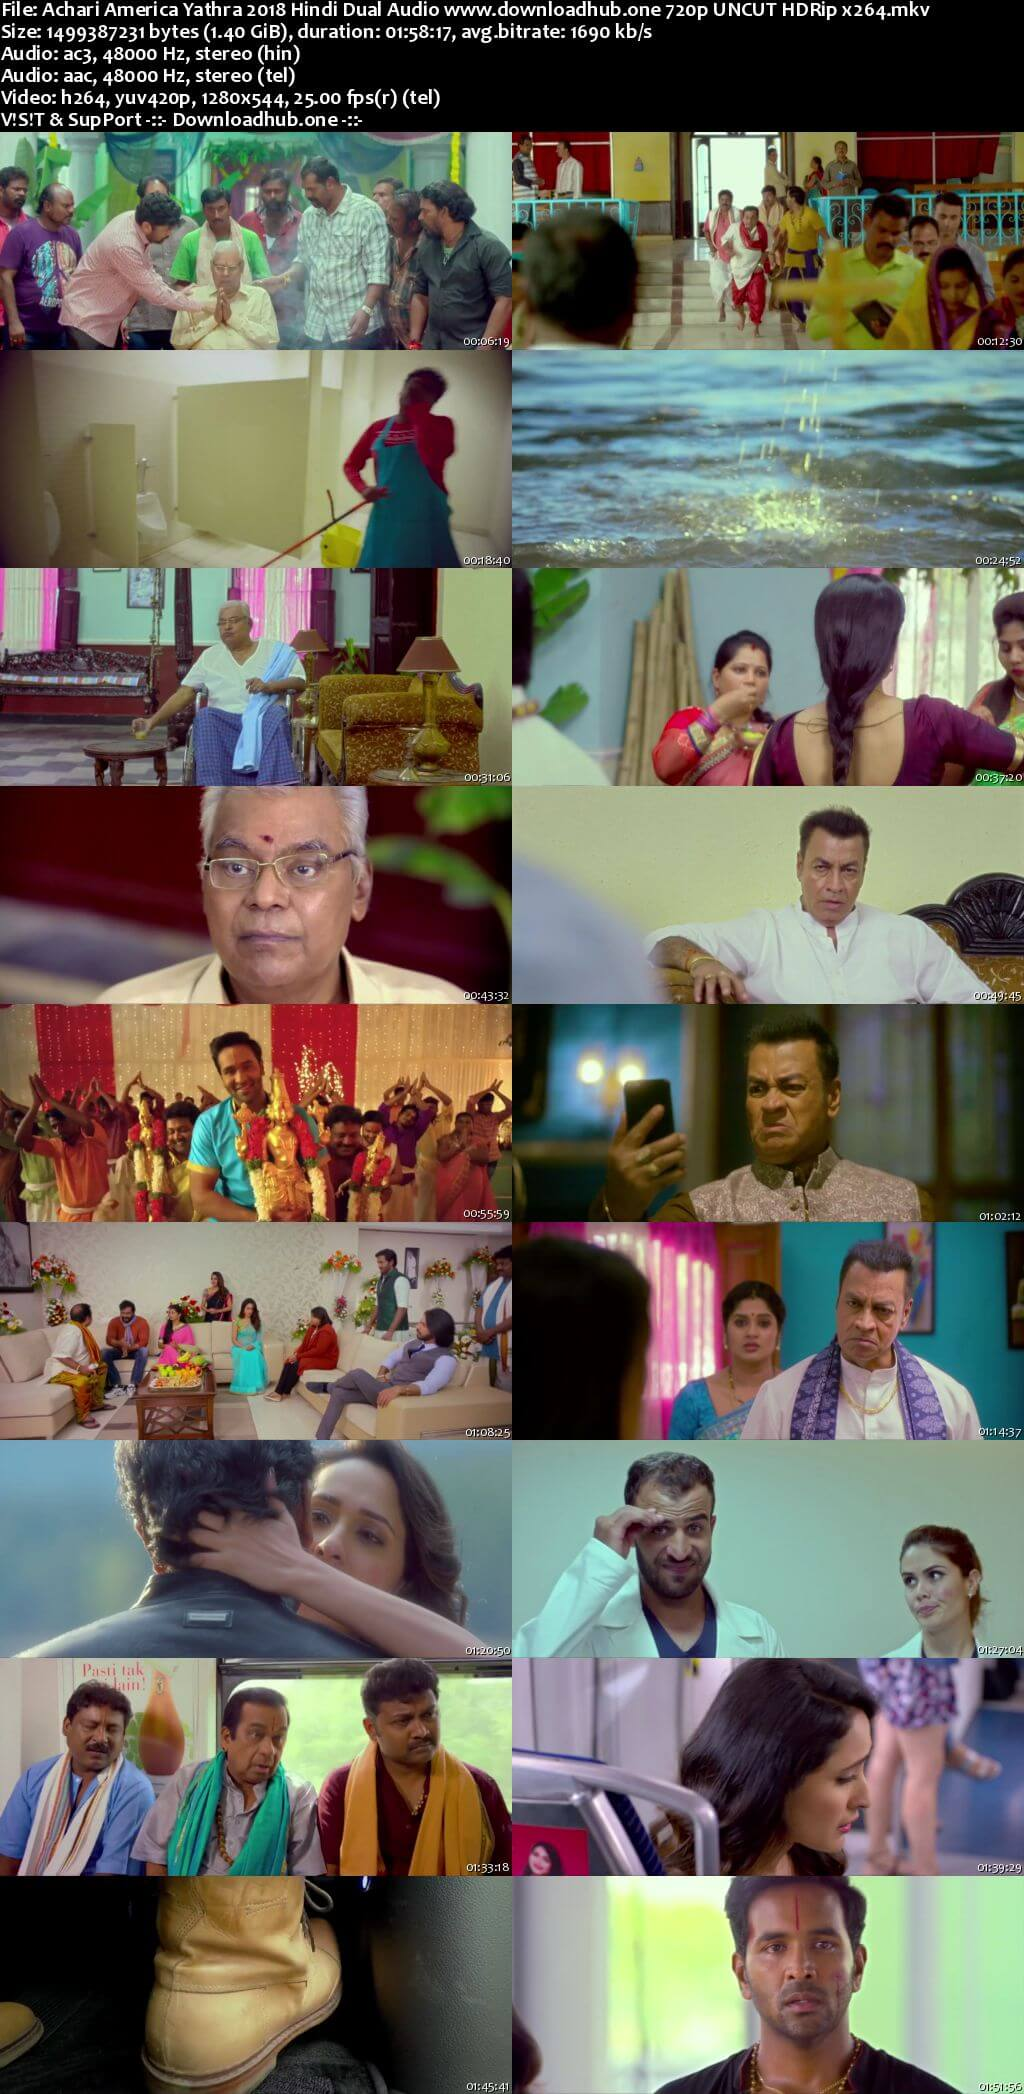 Achari America Yathra 2018 Hindi Dual Audio 720p UNCUT HDRip x264